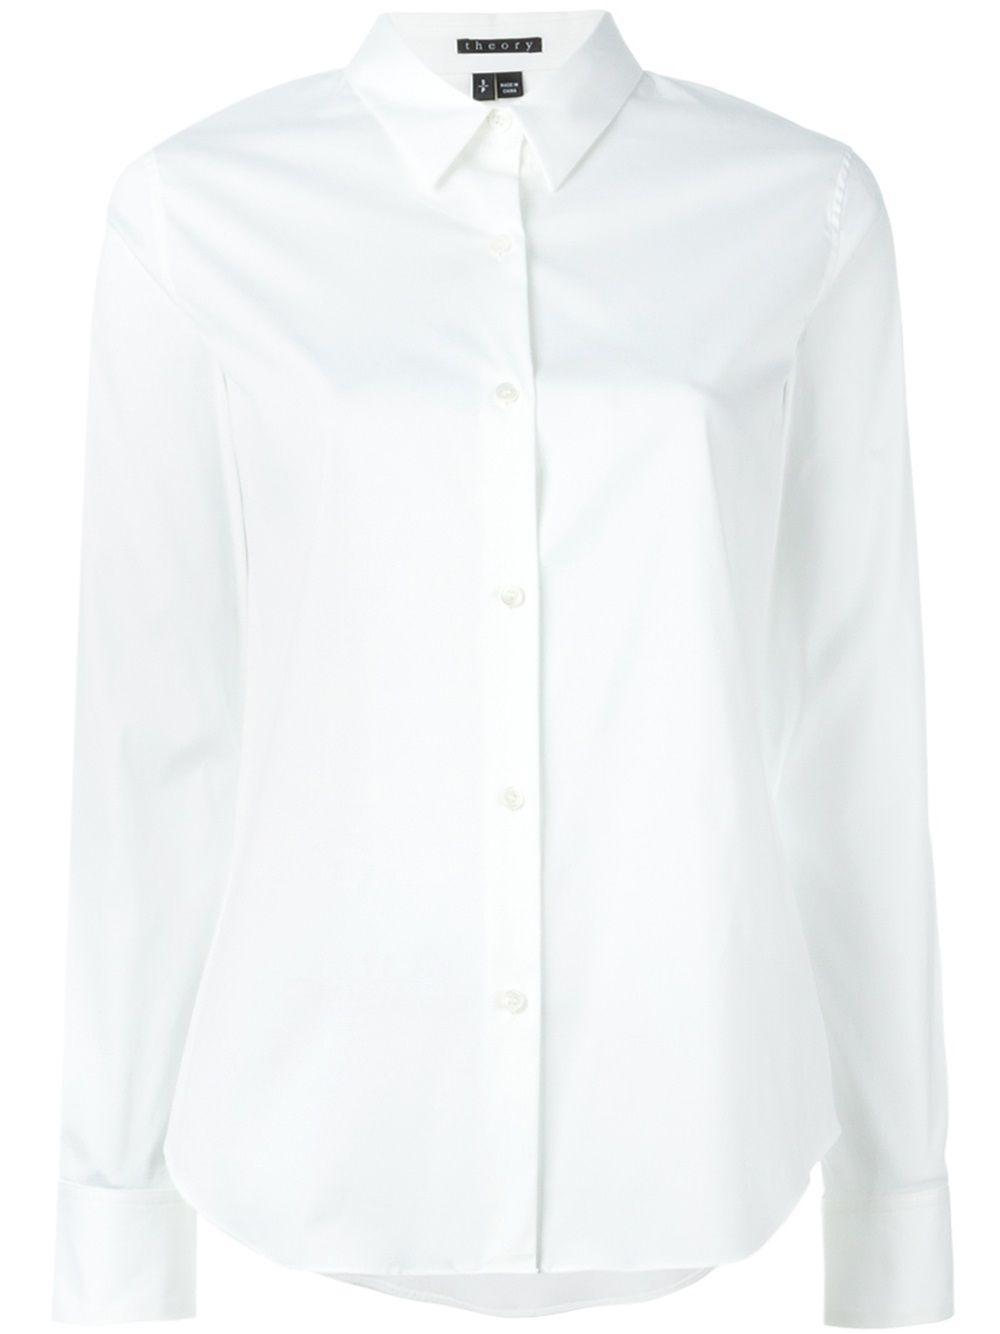 Tenia Cotton Luxe Buttondown Shirt